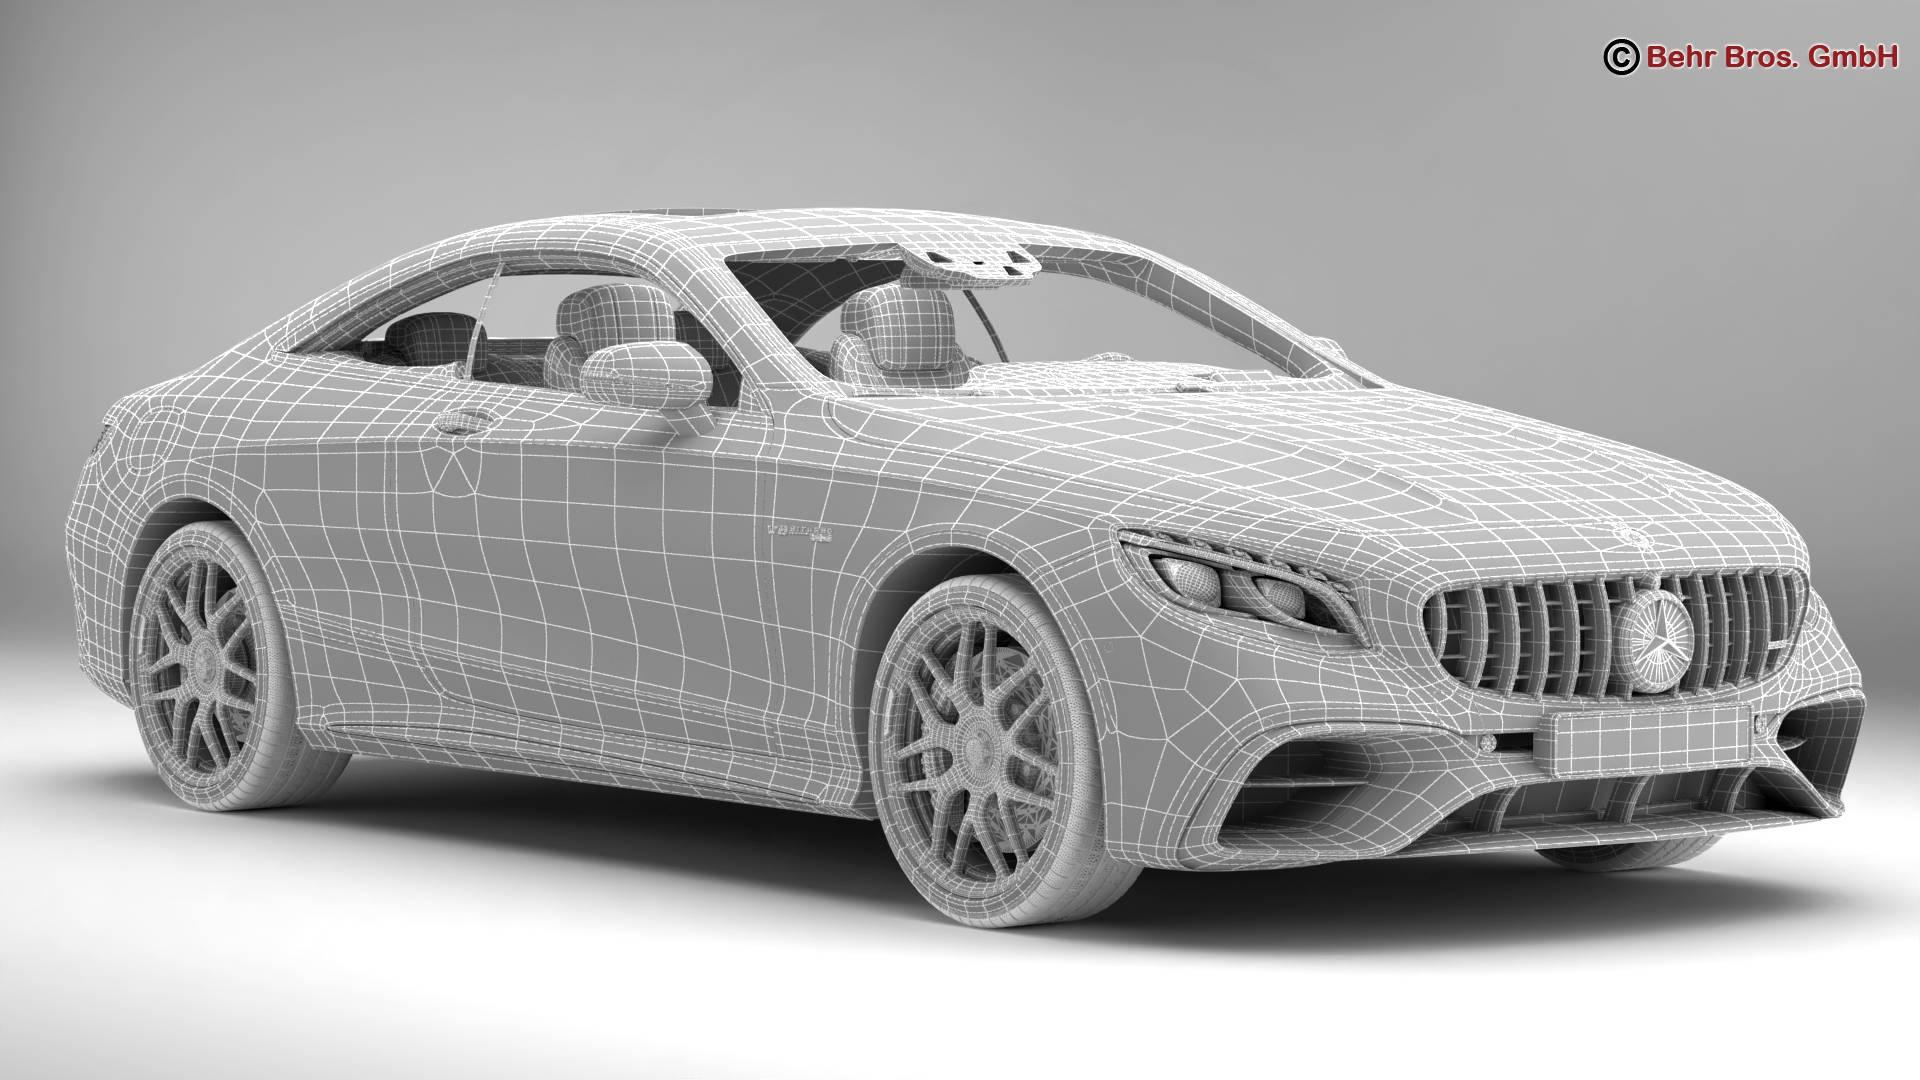 mercedes s class coupe amg s63 2018 3d model 3ds max fbx c4d lwo ma mb obj 274105